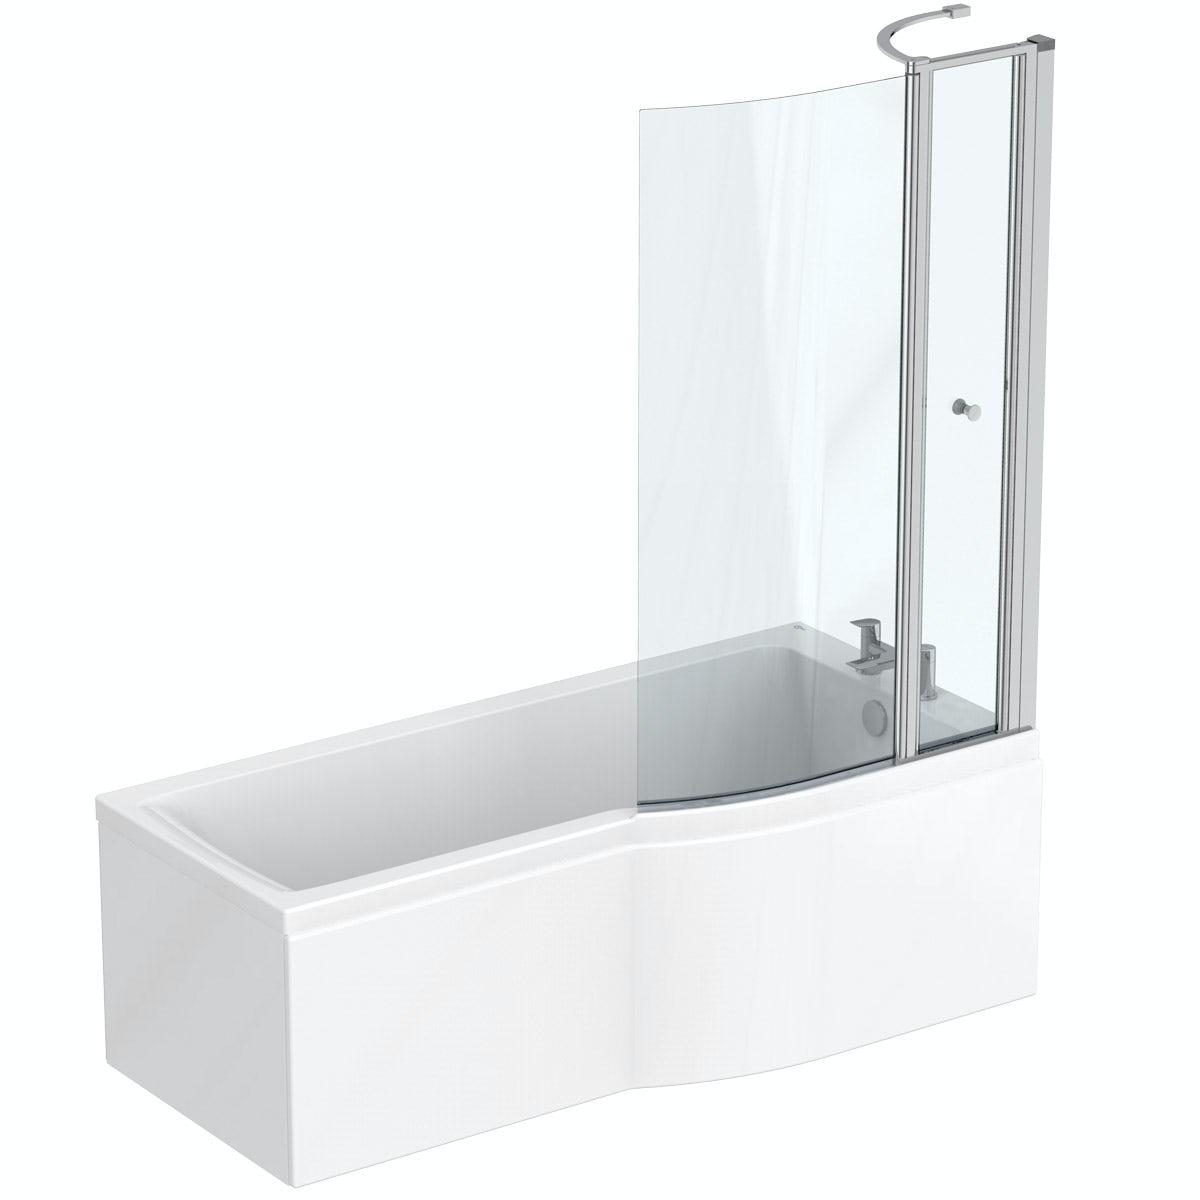 Ideal Standard Concept Air Right Hand Idealform Plus Bath